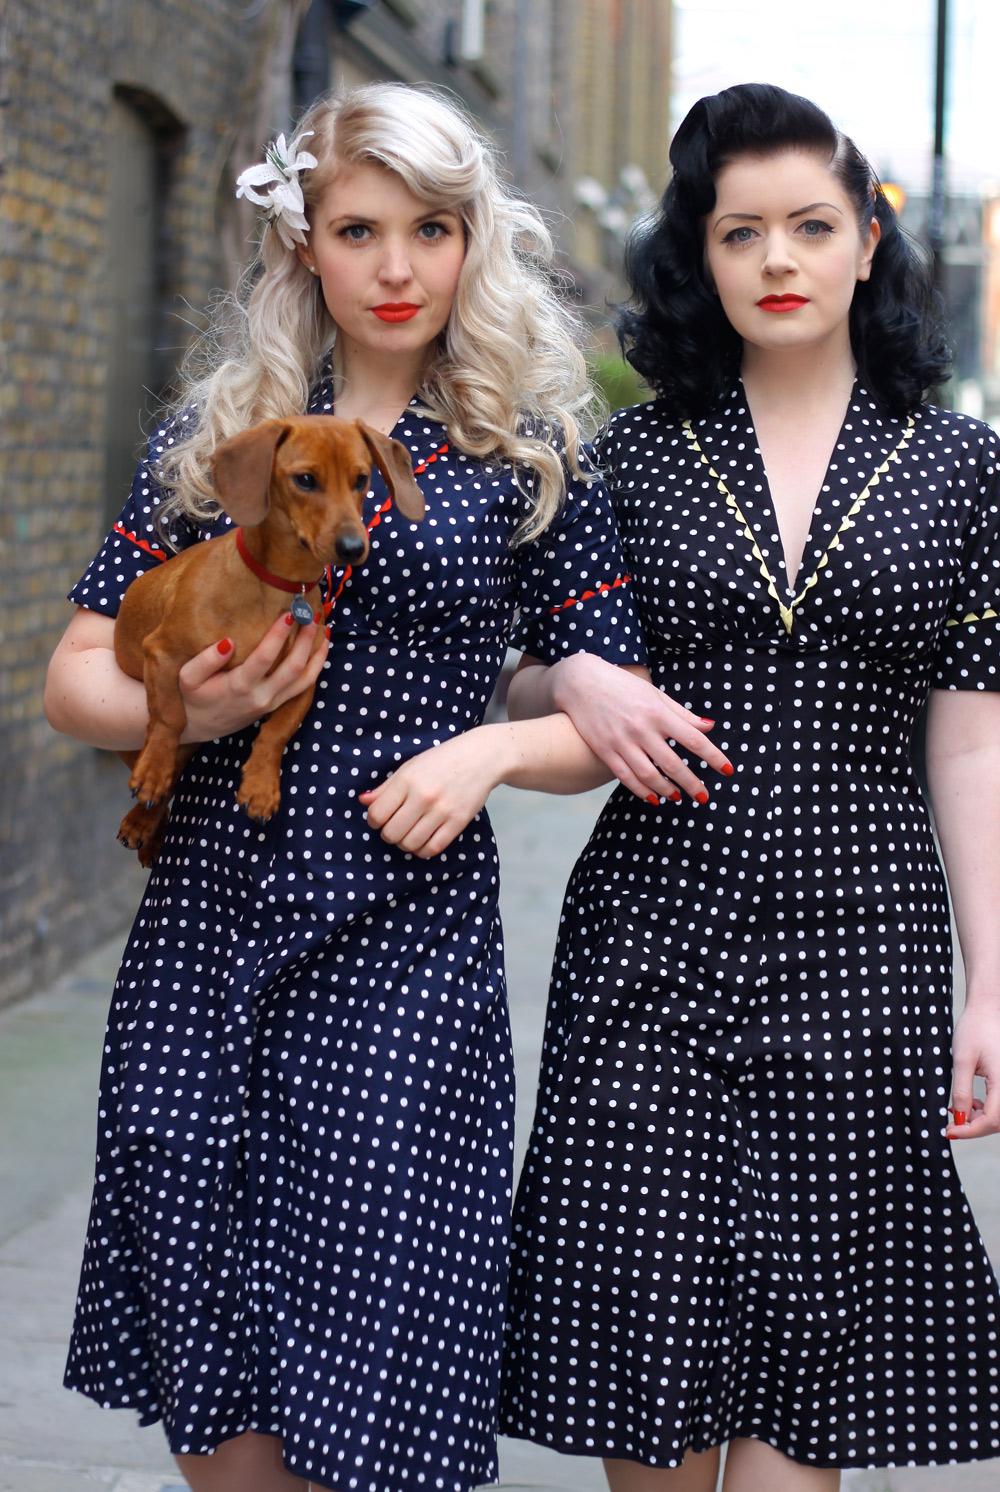 Tara Starlet 1940s 40s Style: Quality Time: Vtg Inspiration: Tara Starlet